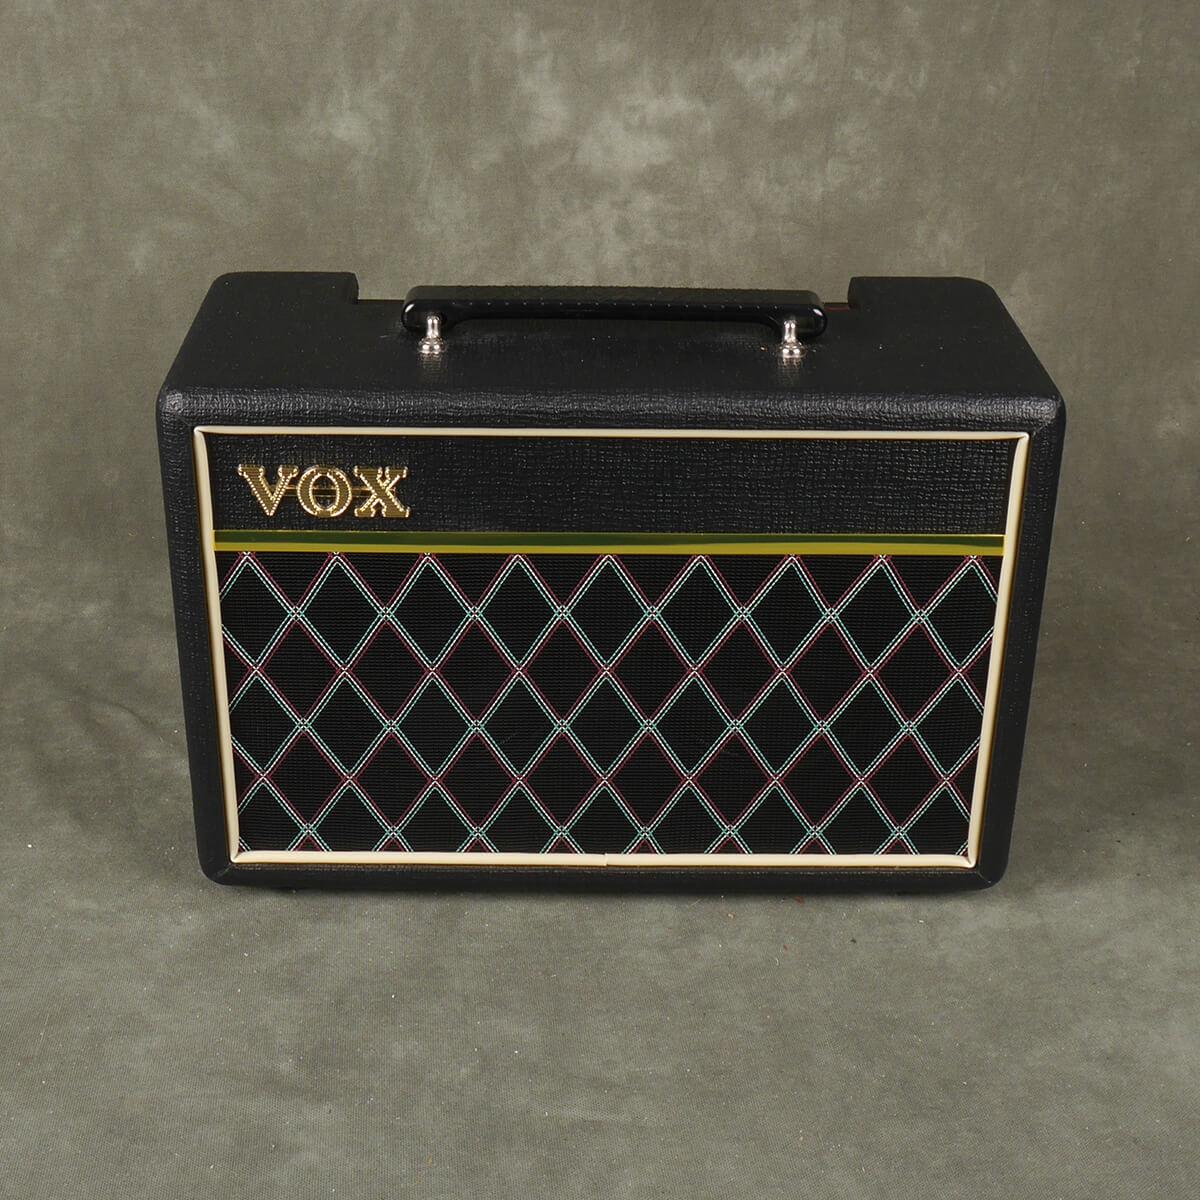 Vox Pathfinder Bass 10 Combo Amplifier - 2nd Hand